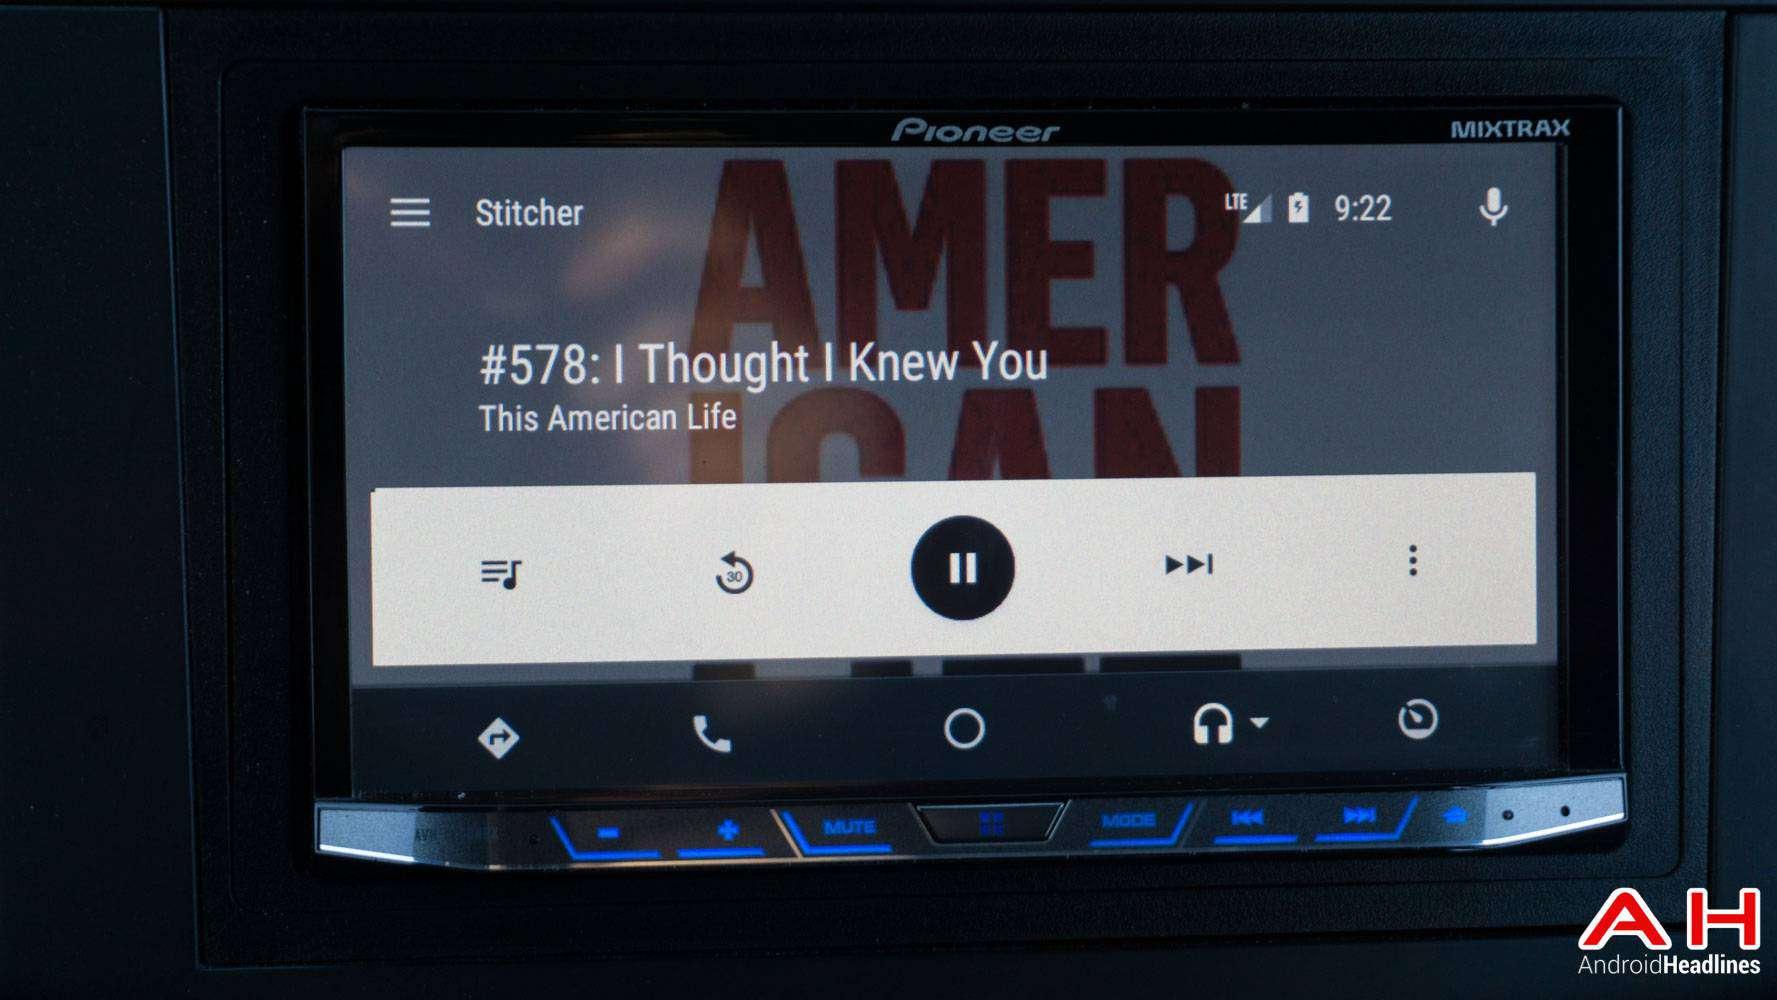 Stitcher-Android-Auto-AH-00166